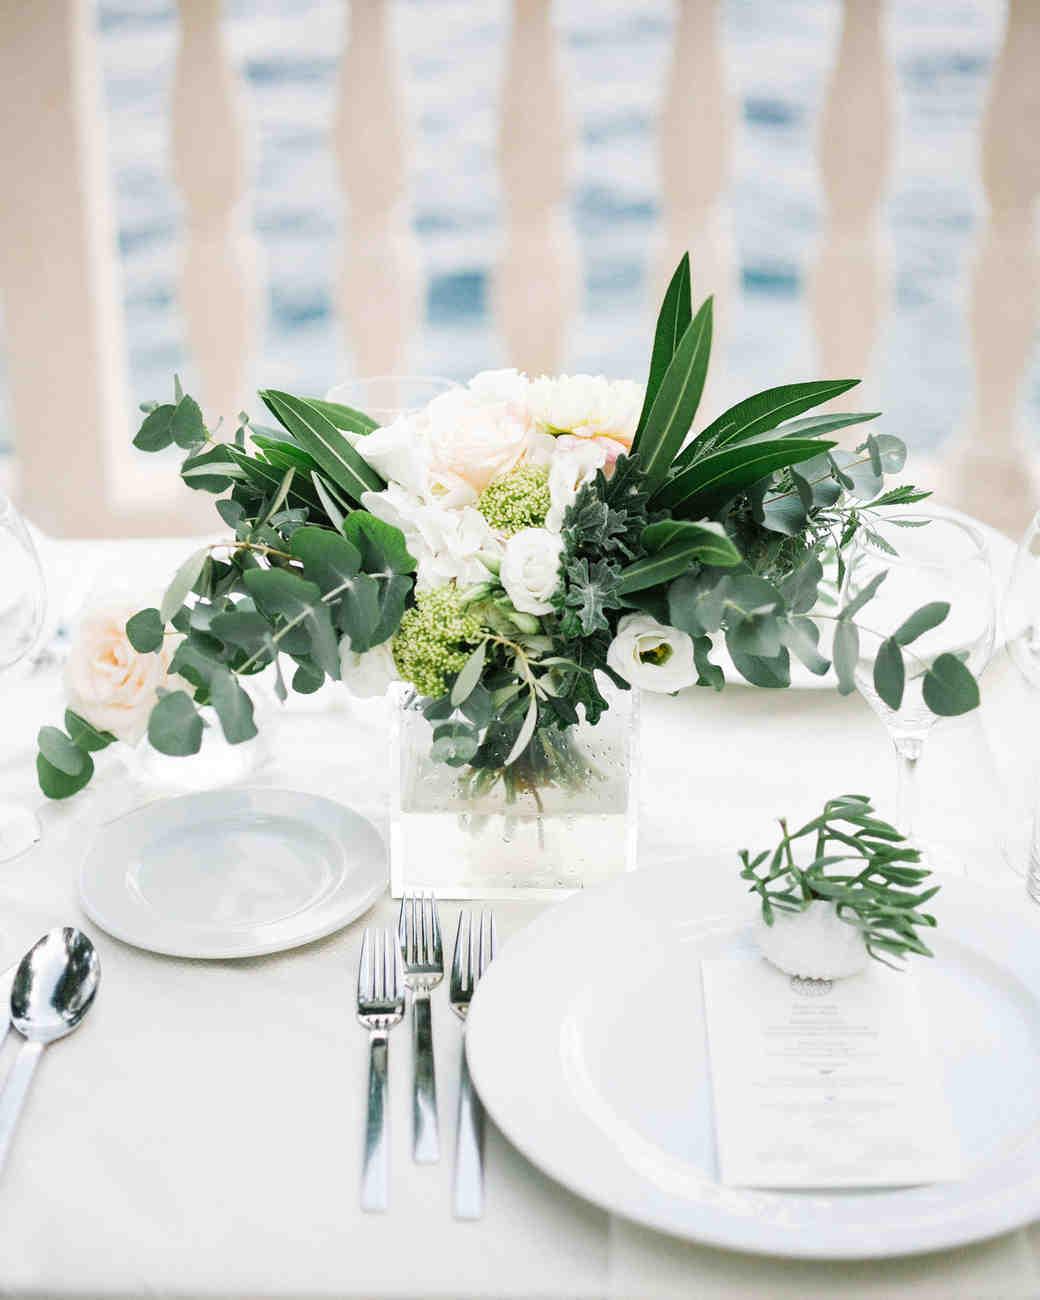 melissa-mike-wedding-placesetting-0191-s112764-0316.jpg